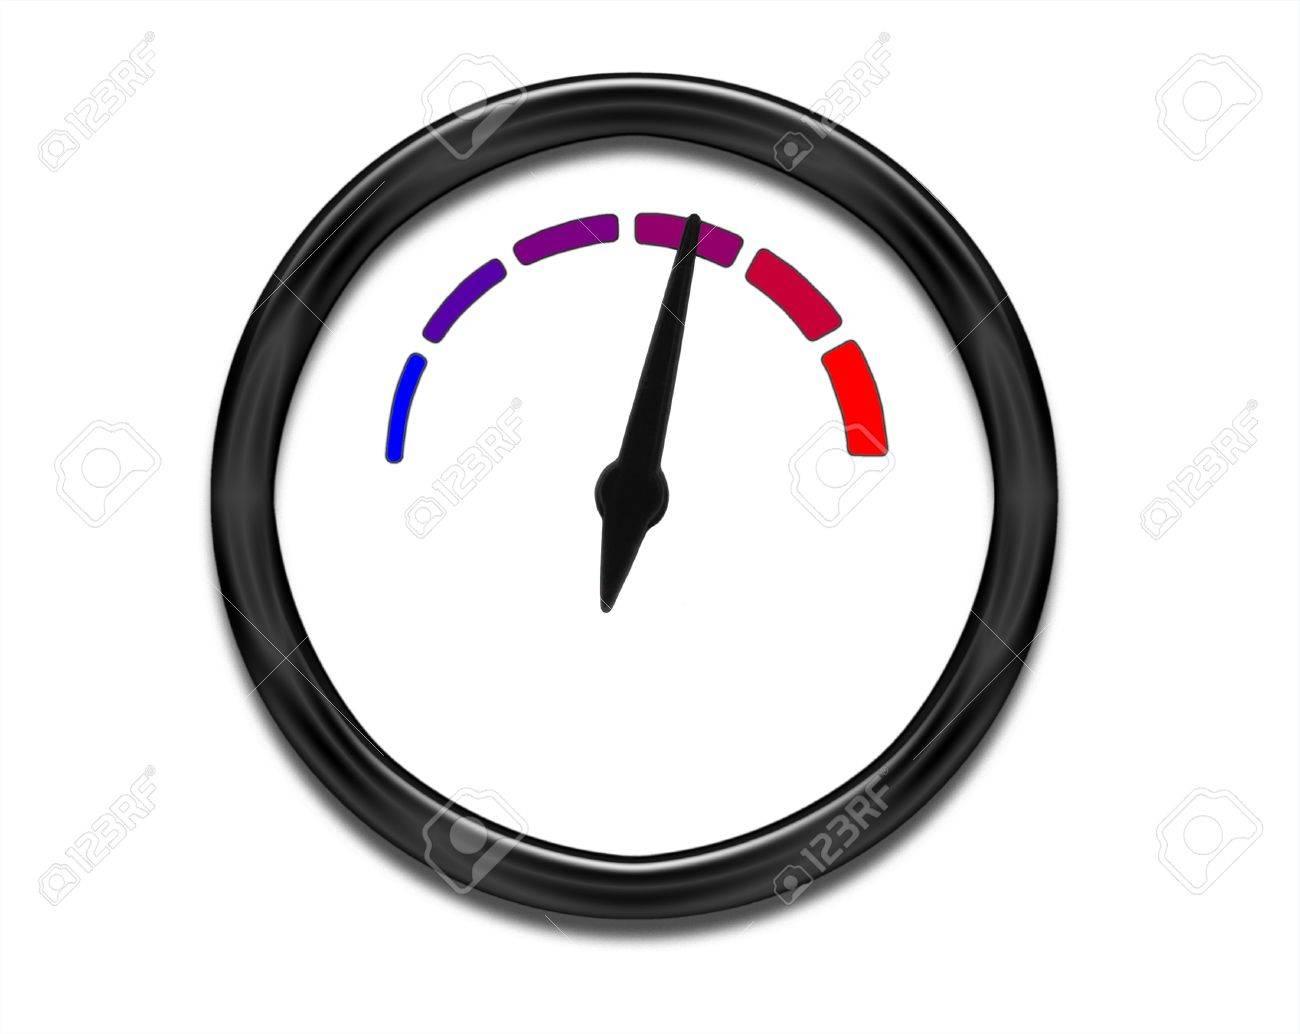 Temperature rising - stress, pressure, global warming concept Stock Photo - 8148520